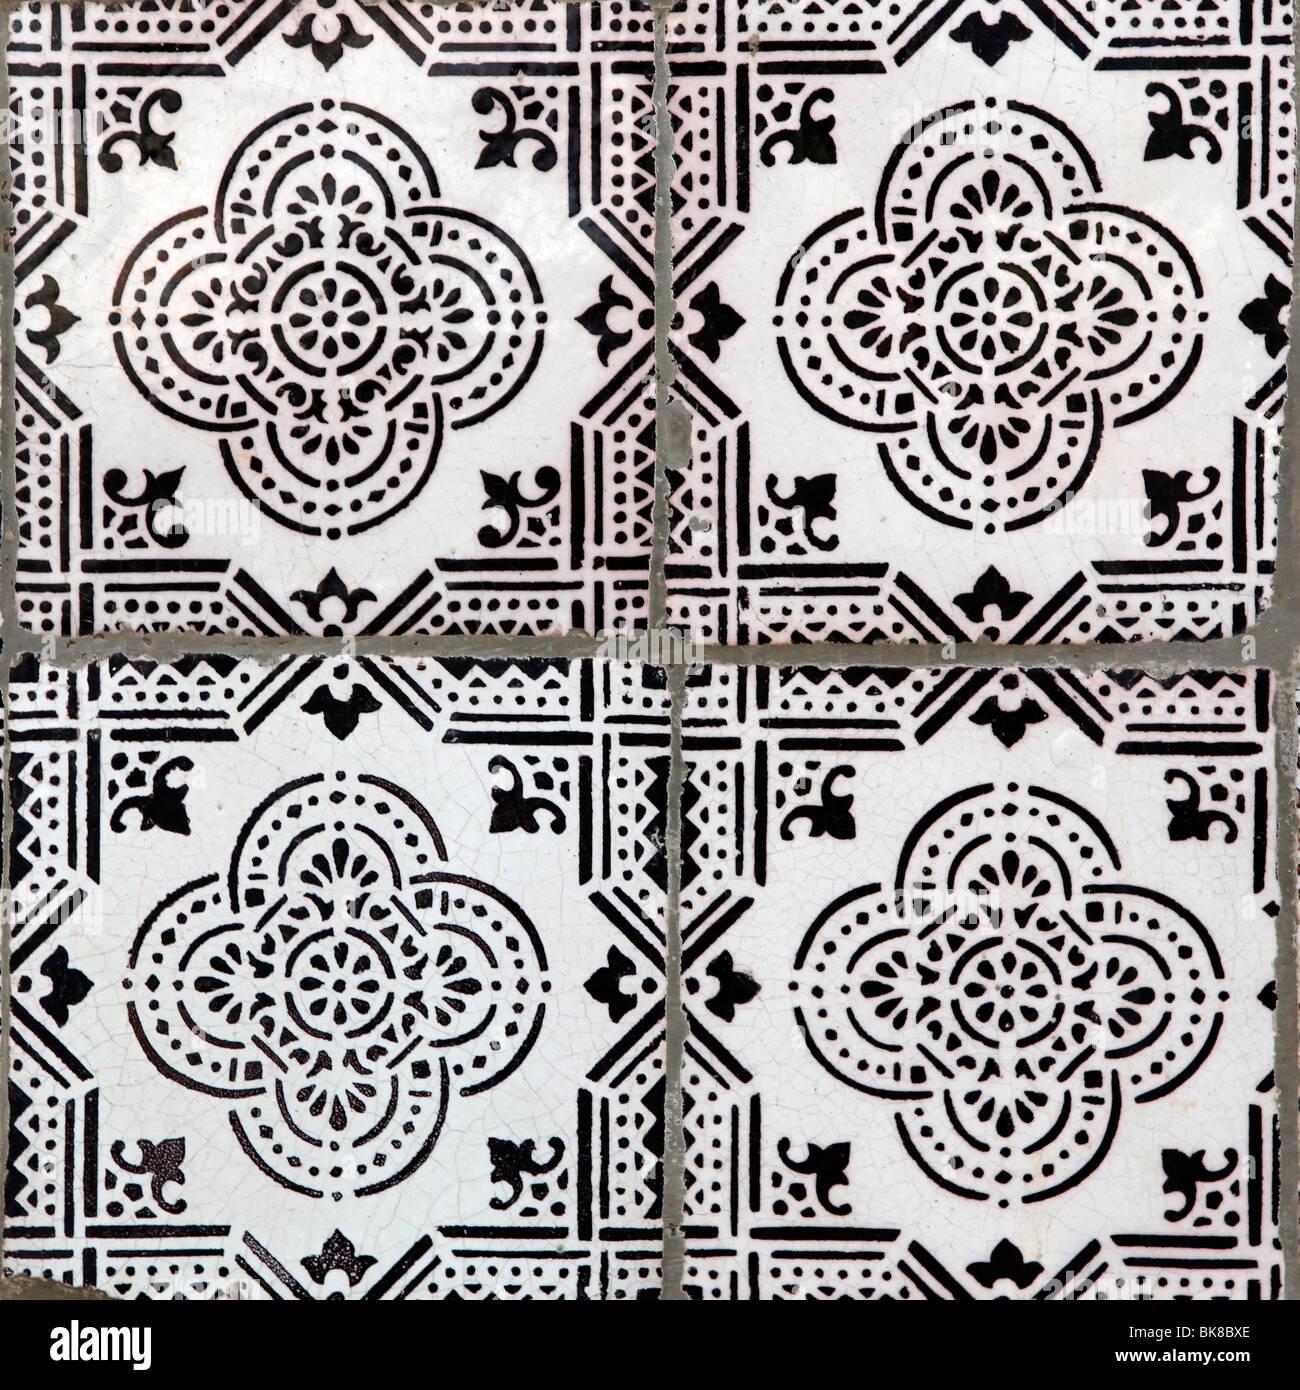 Azulejos tiles front façade building Lisbon Portugal Europe - Stock Image